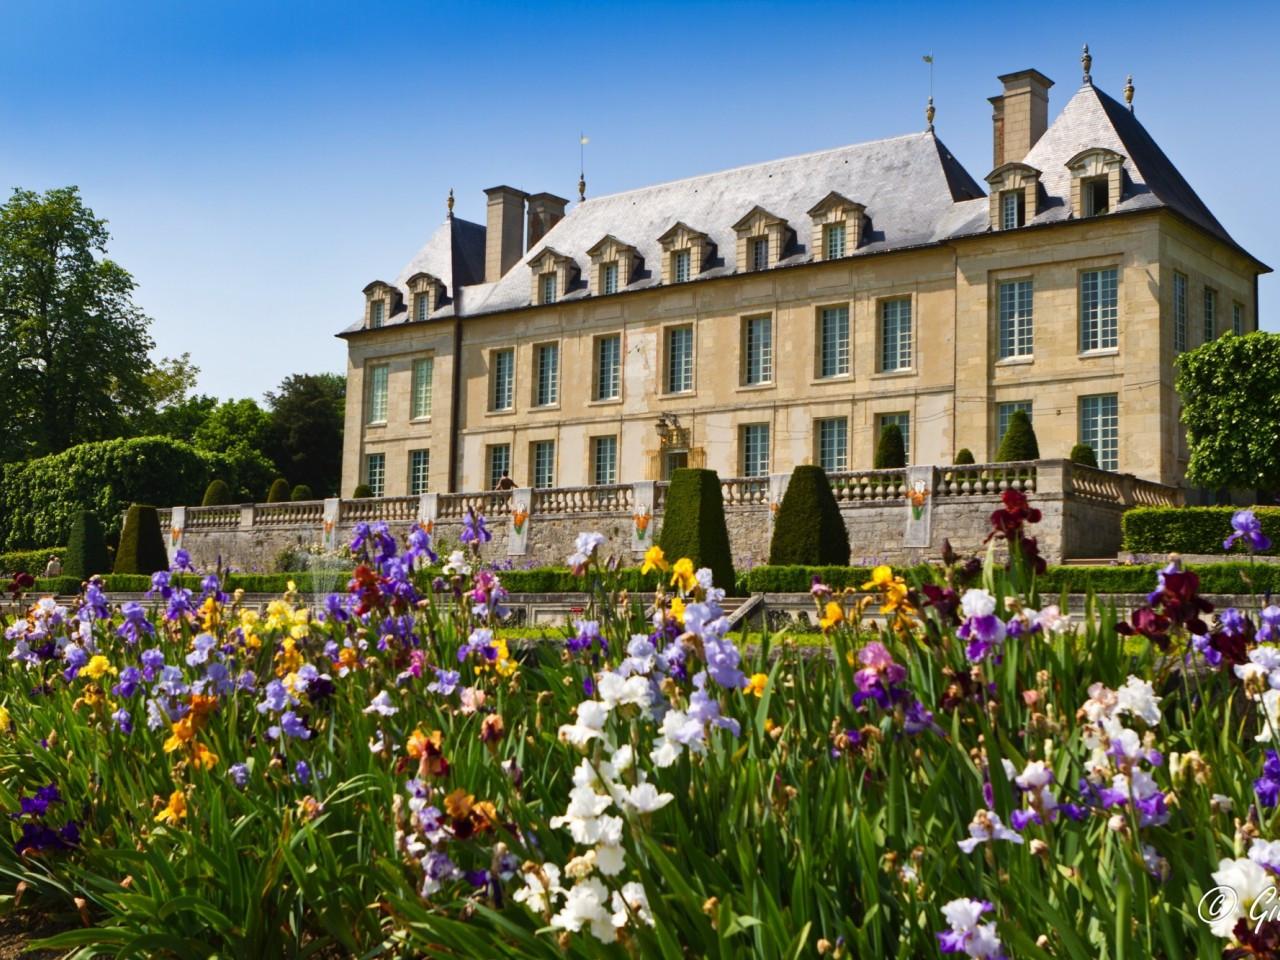 Visita Château de Auvers sur Oise - Sulle orme degli impressionisti | Parigi e dintorni